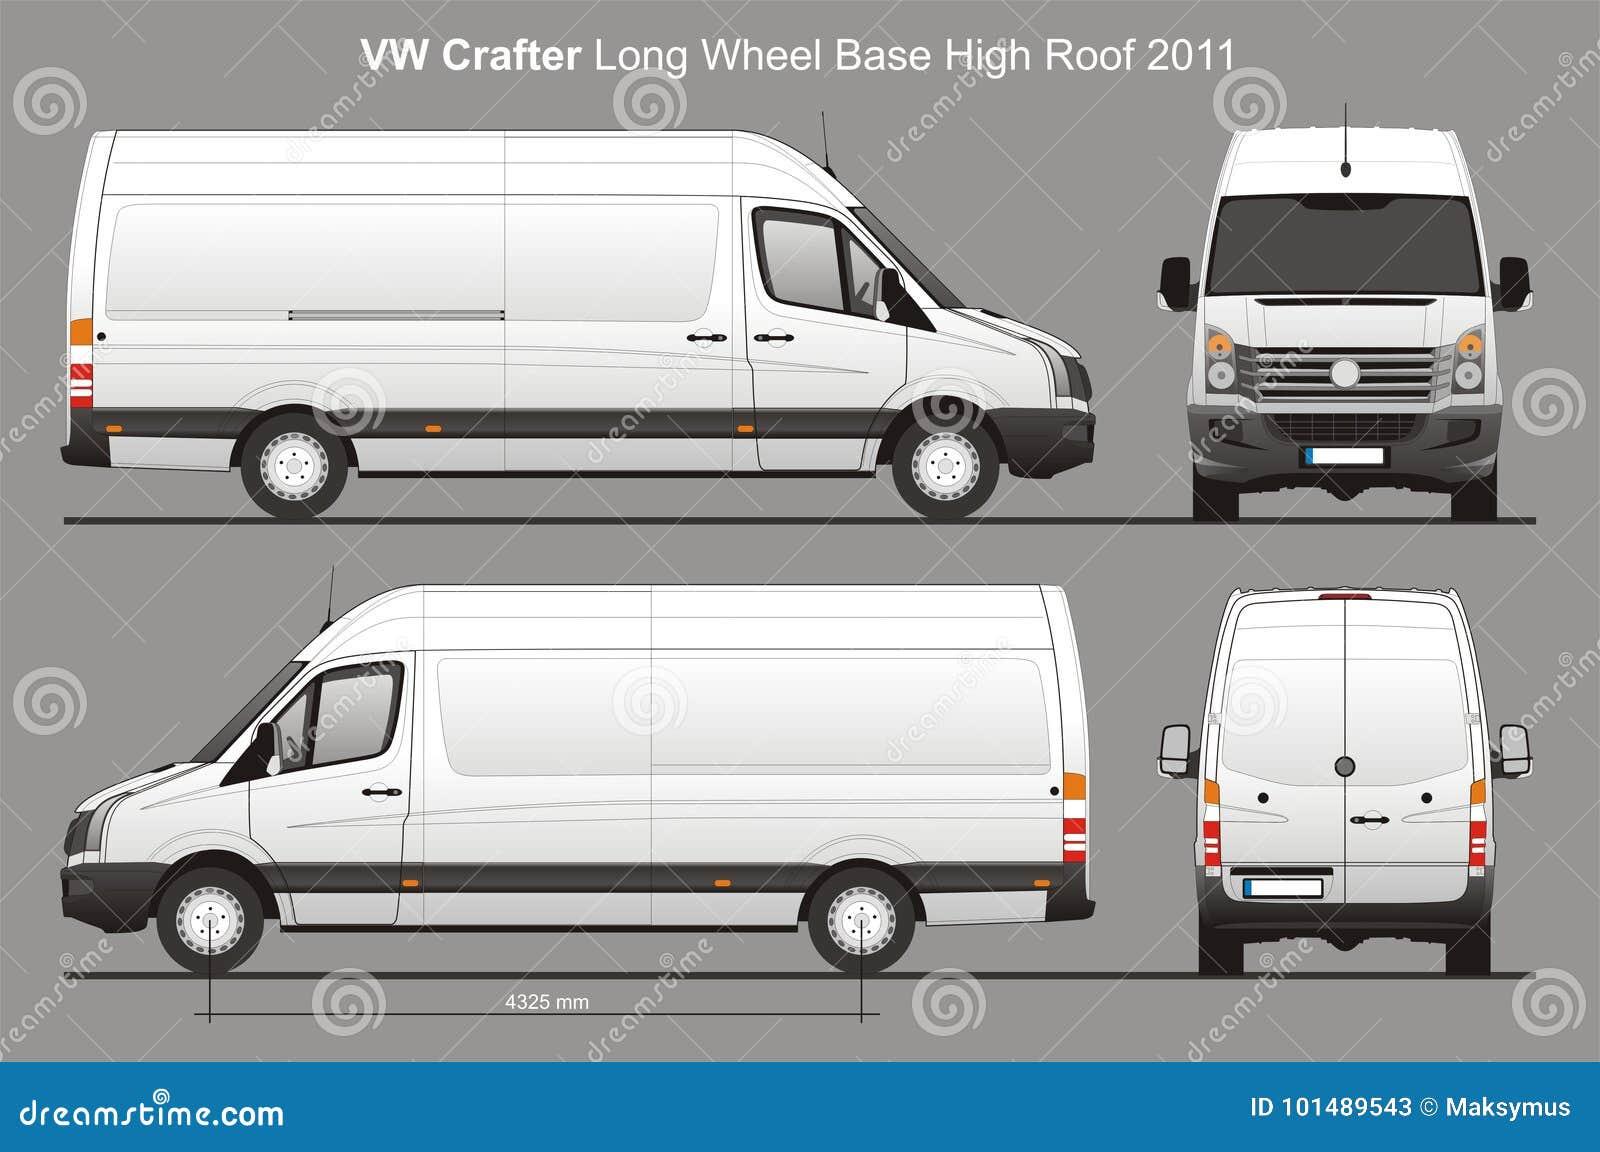 Lieferung Van Blueprint Vw Crafters Lwb Redaktionelles Stockfoto